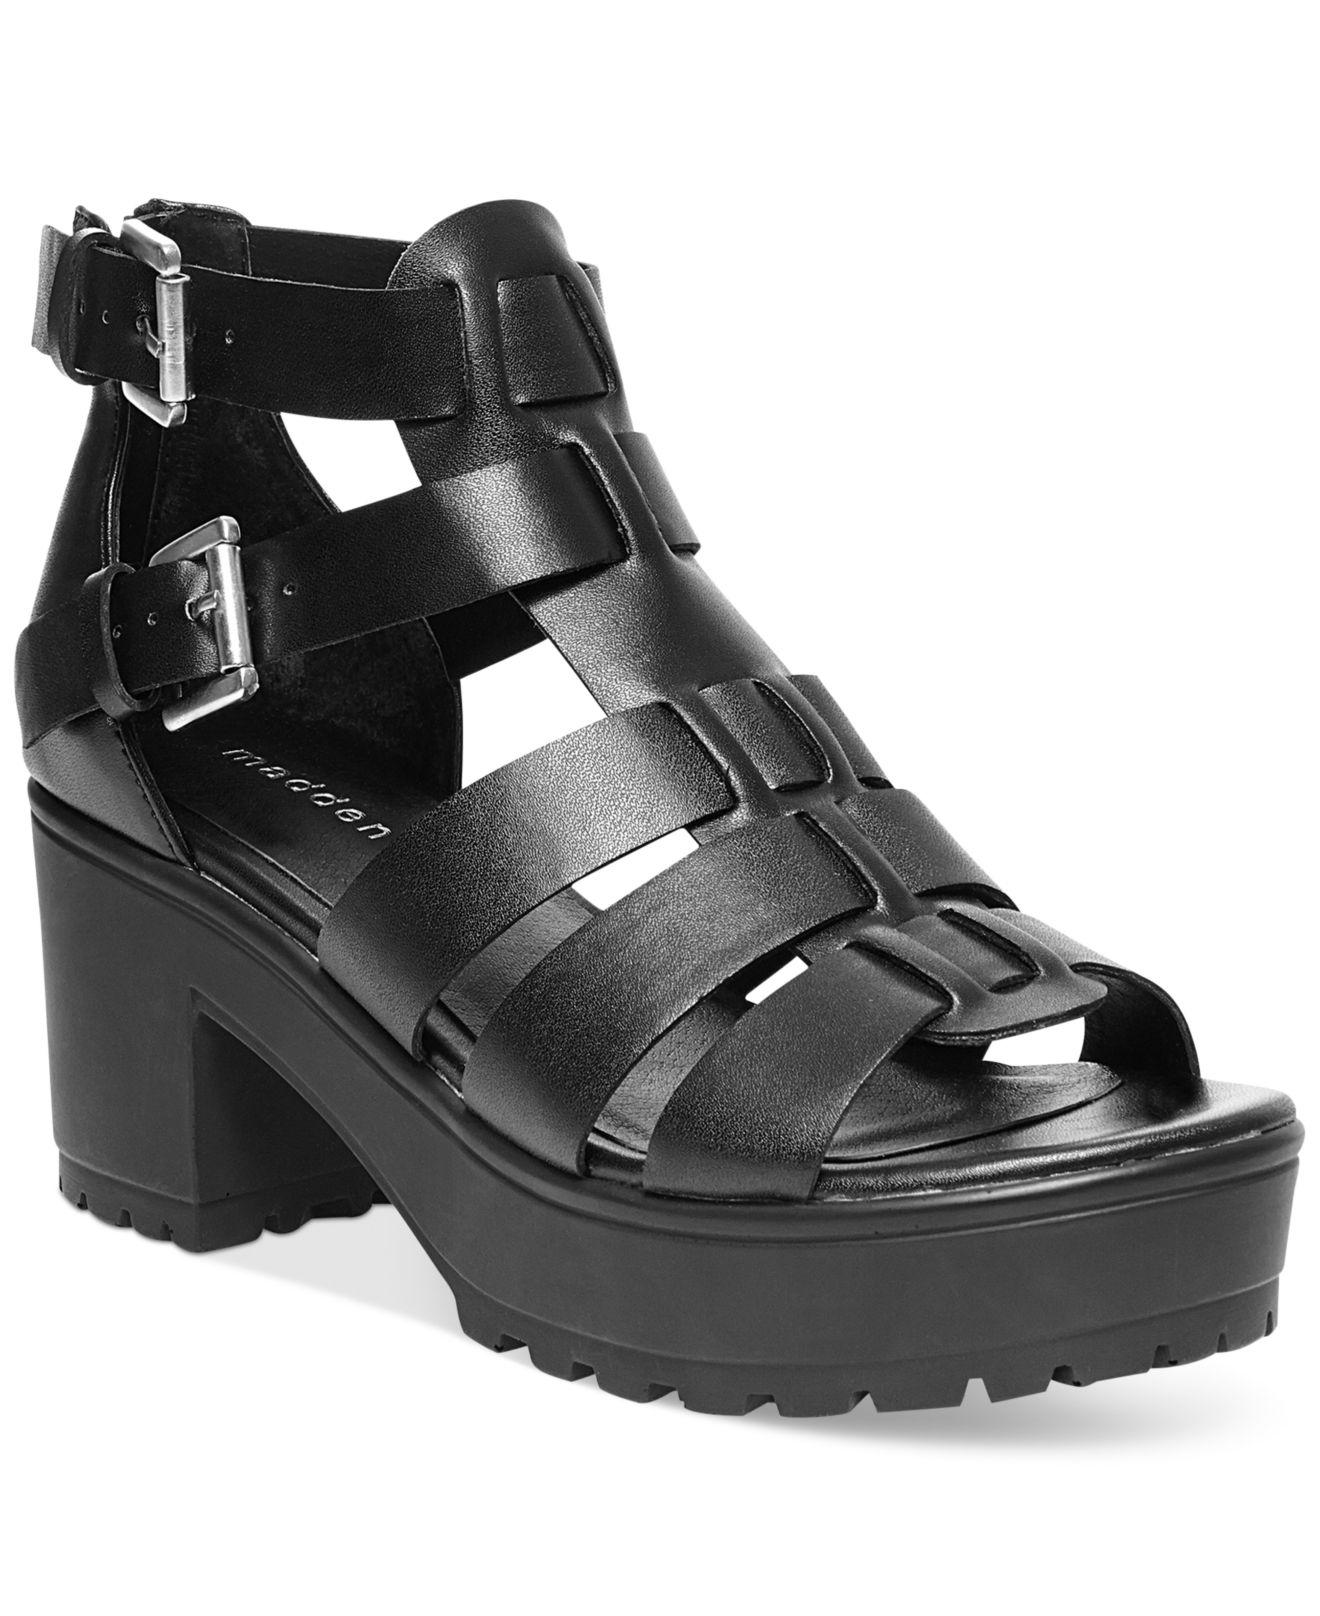 Madden Girl Daizyy Platform Lug Sandals